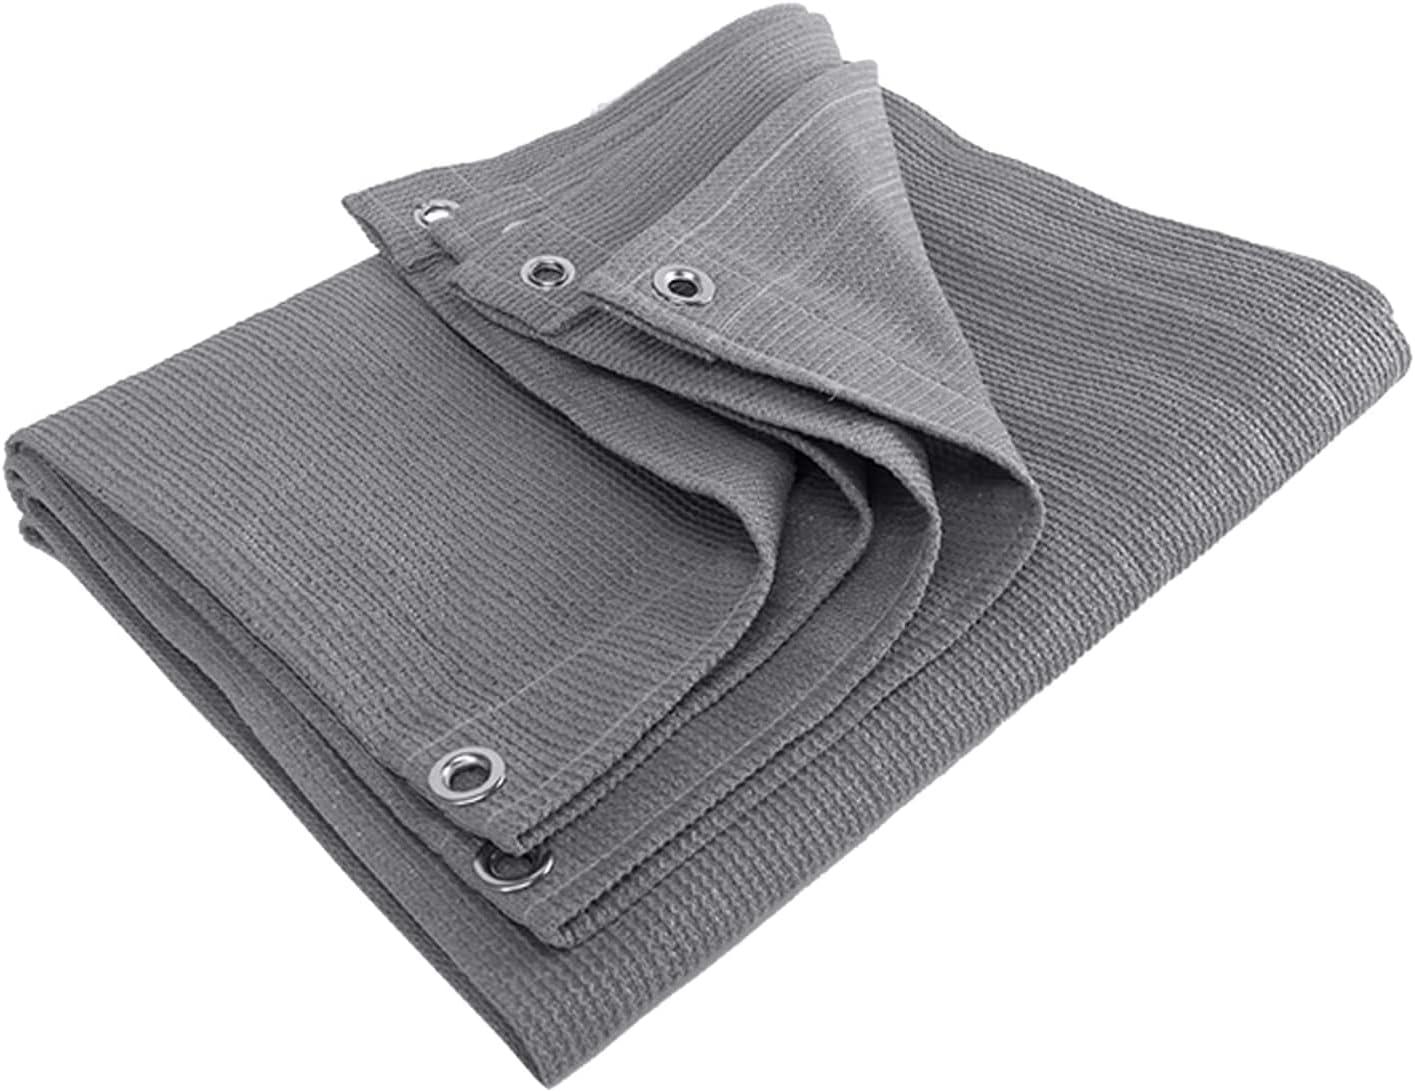 MVNZXL Tarps Multi-Purpose 90% Sun Shade Time sale R Brand new Screen Grey Uv Cloth